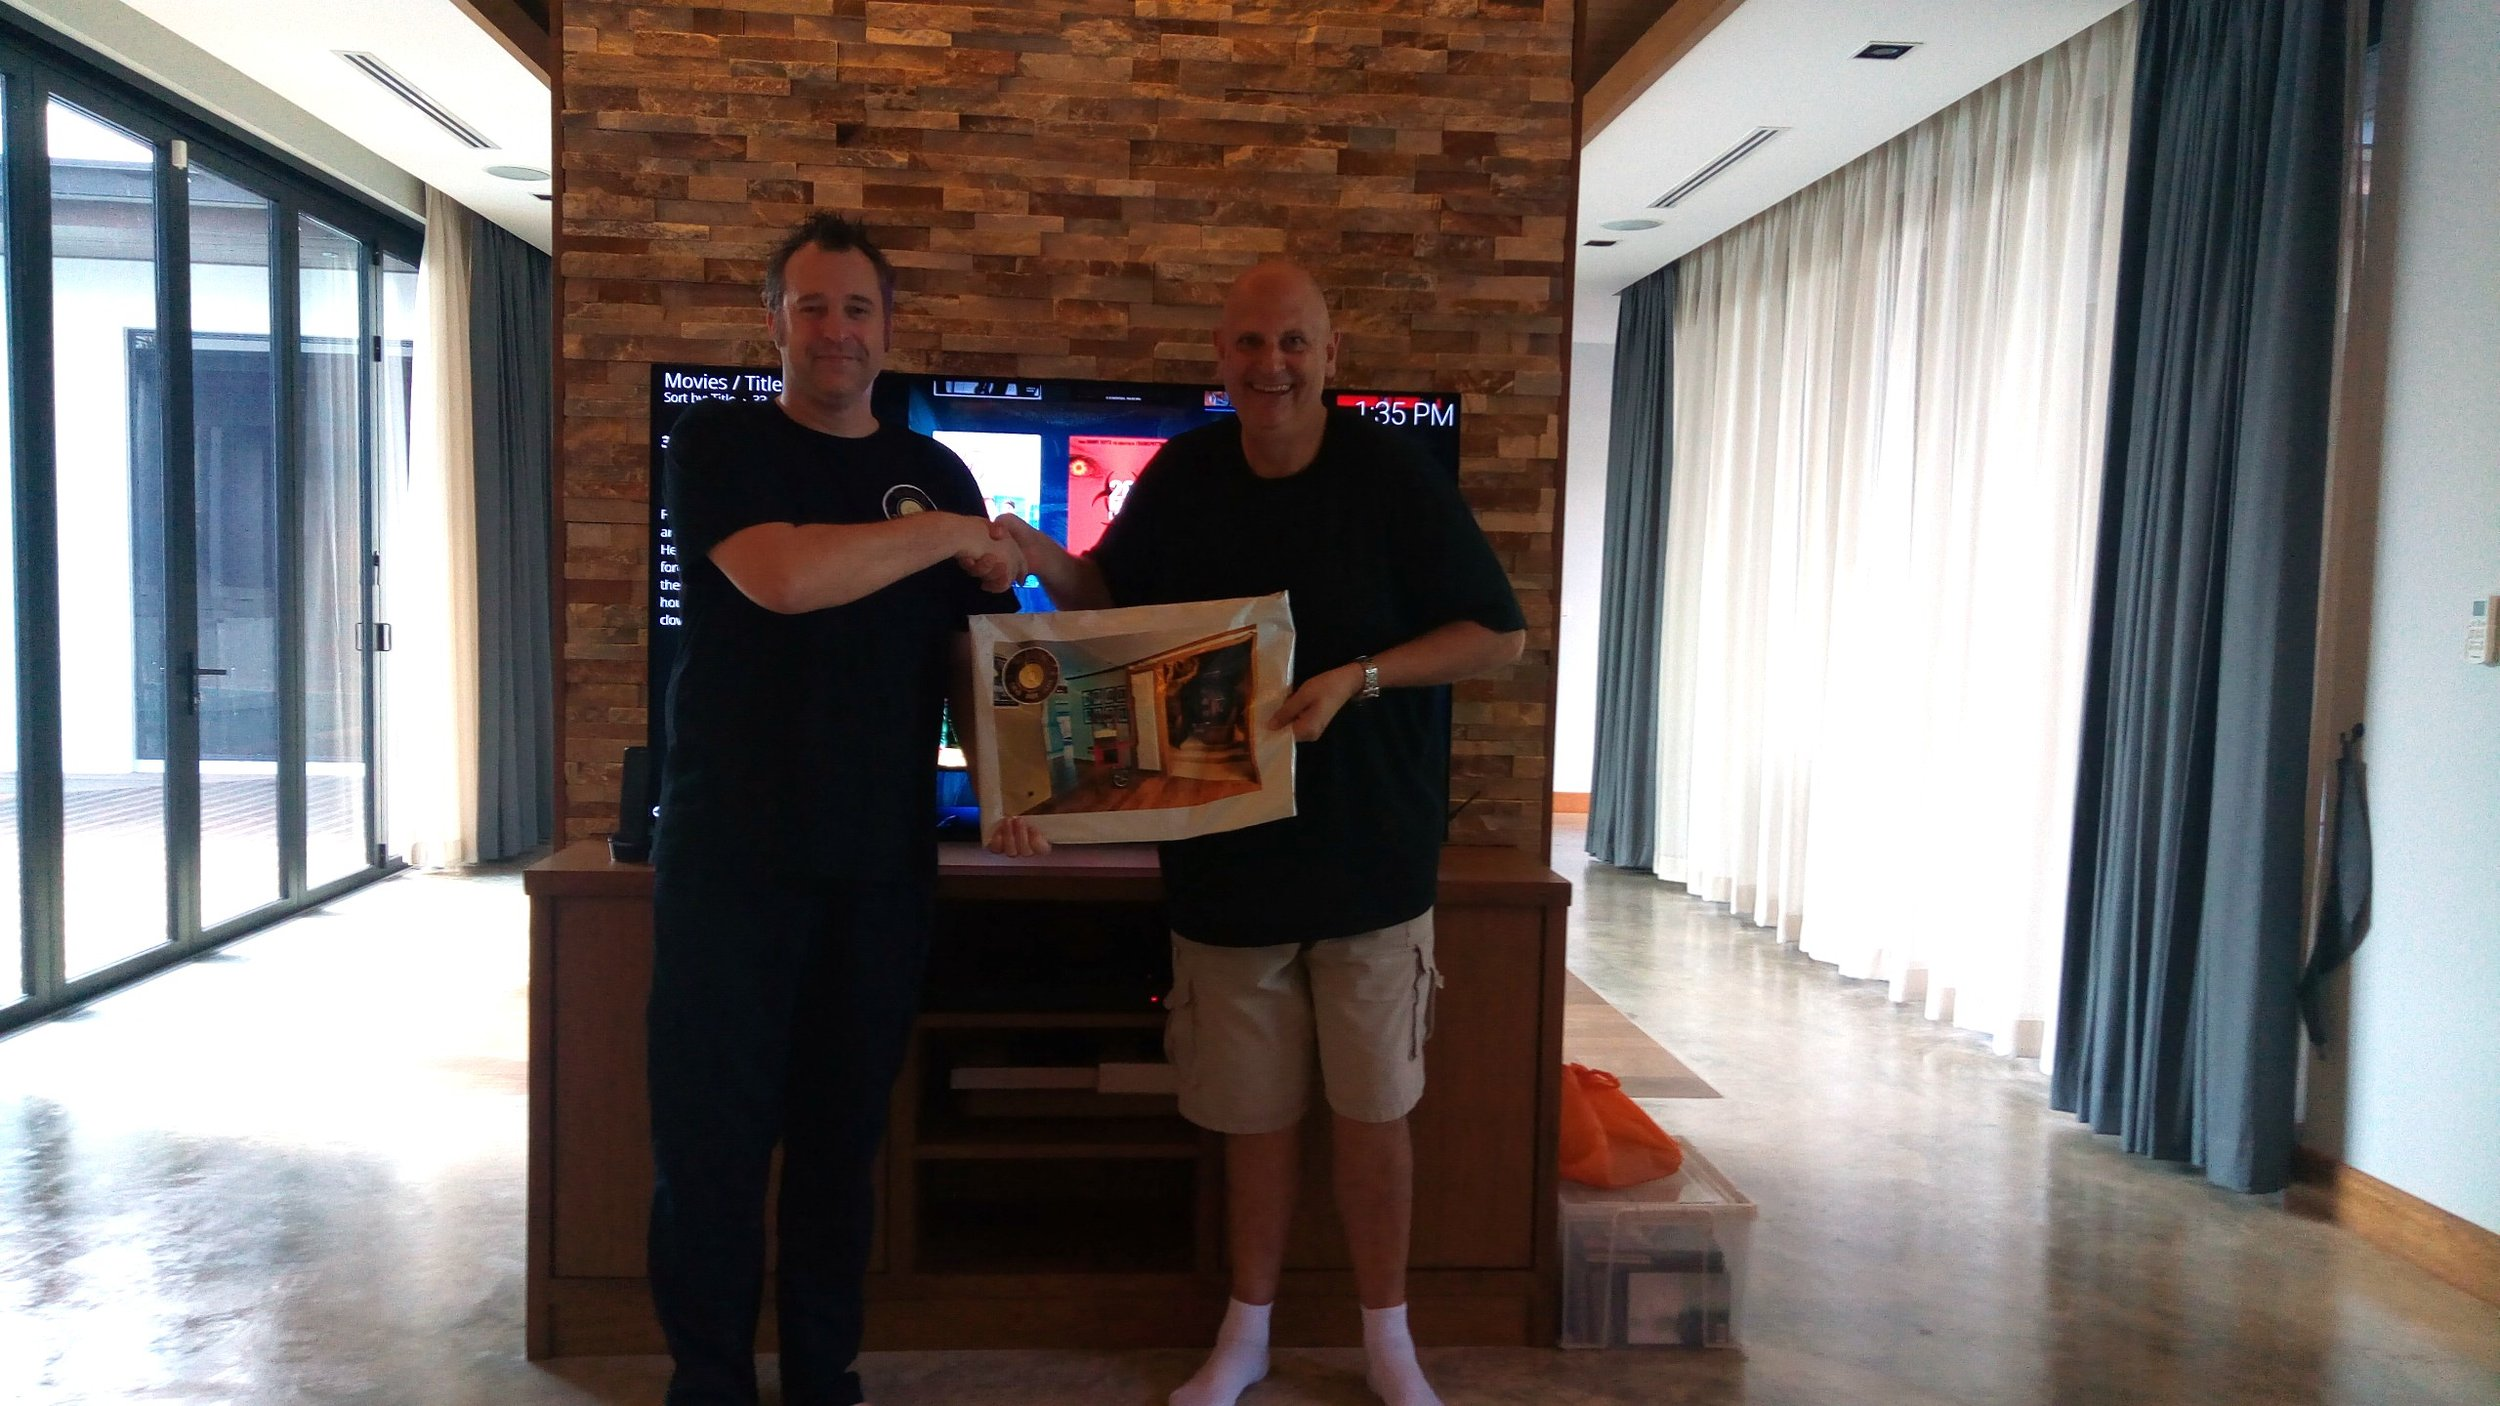 H3 Digital MD Ben Hobbs presents Gerry with his Smart Home handover pack.